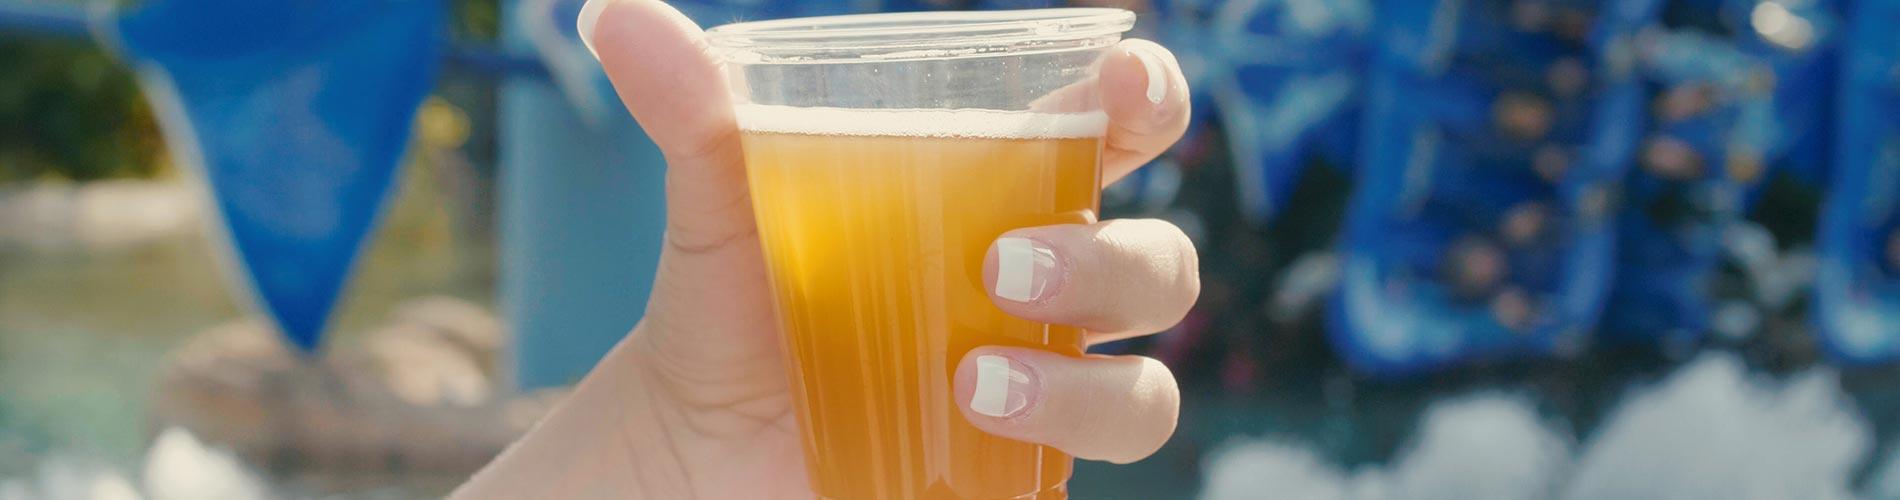 Free Beer Summer at SeaWorld Orlando